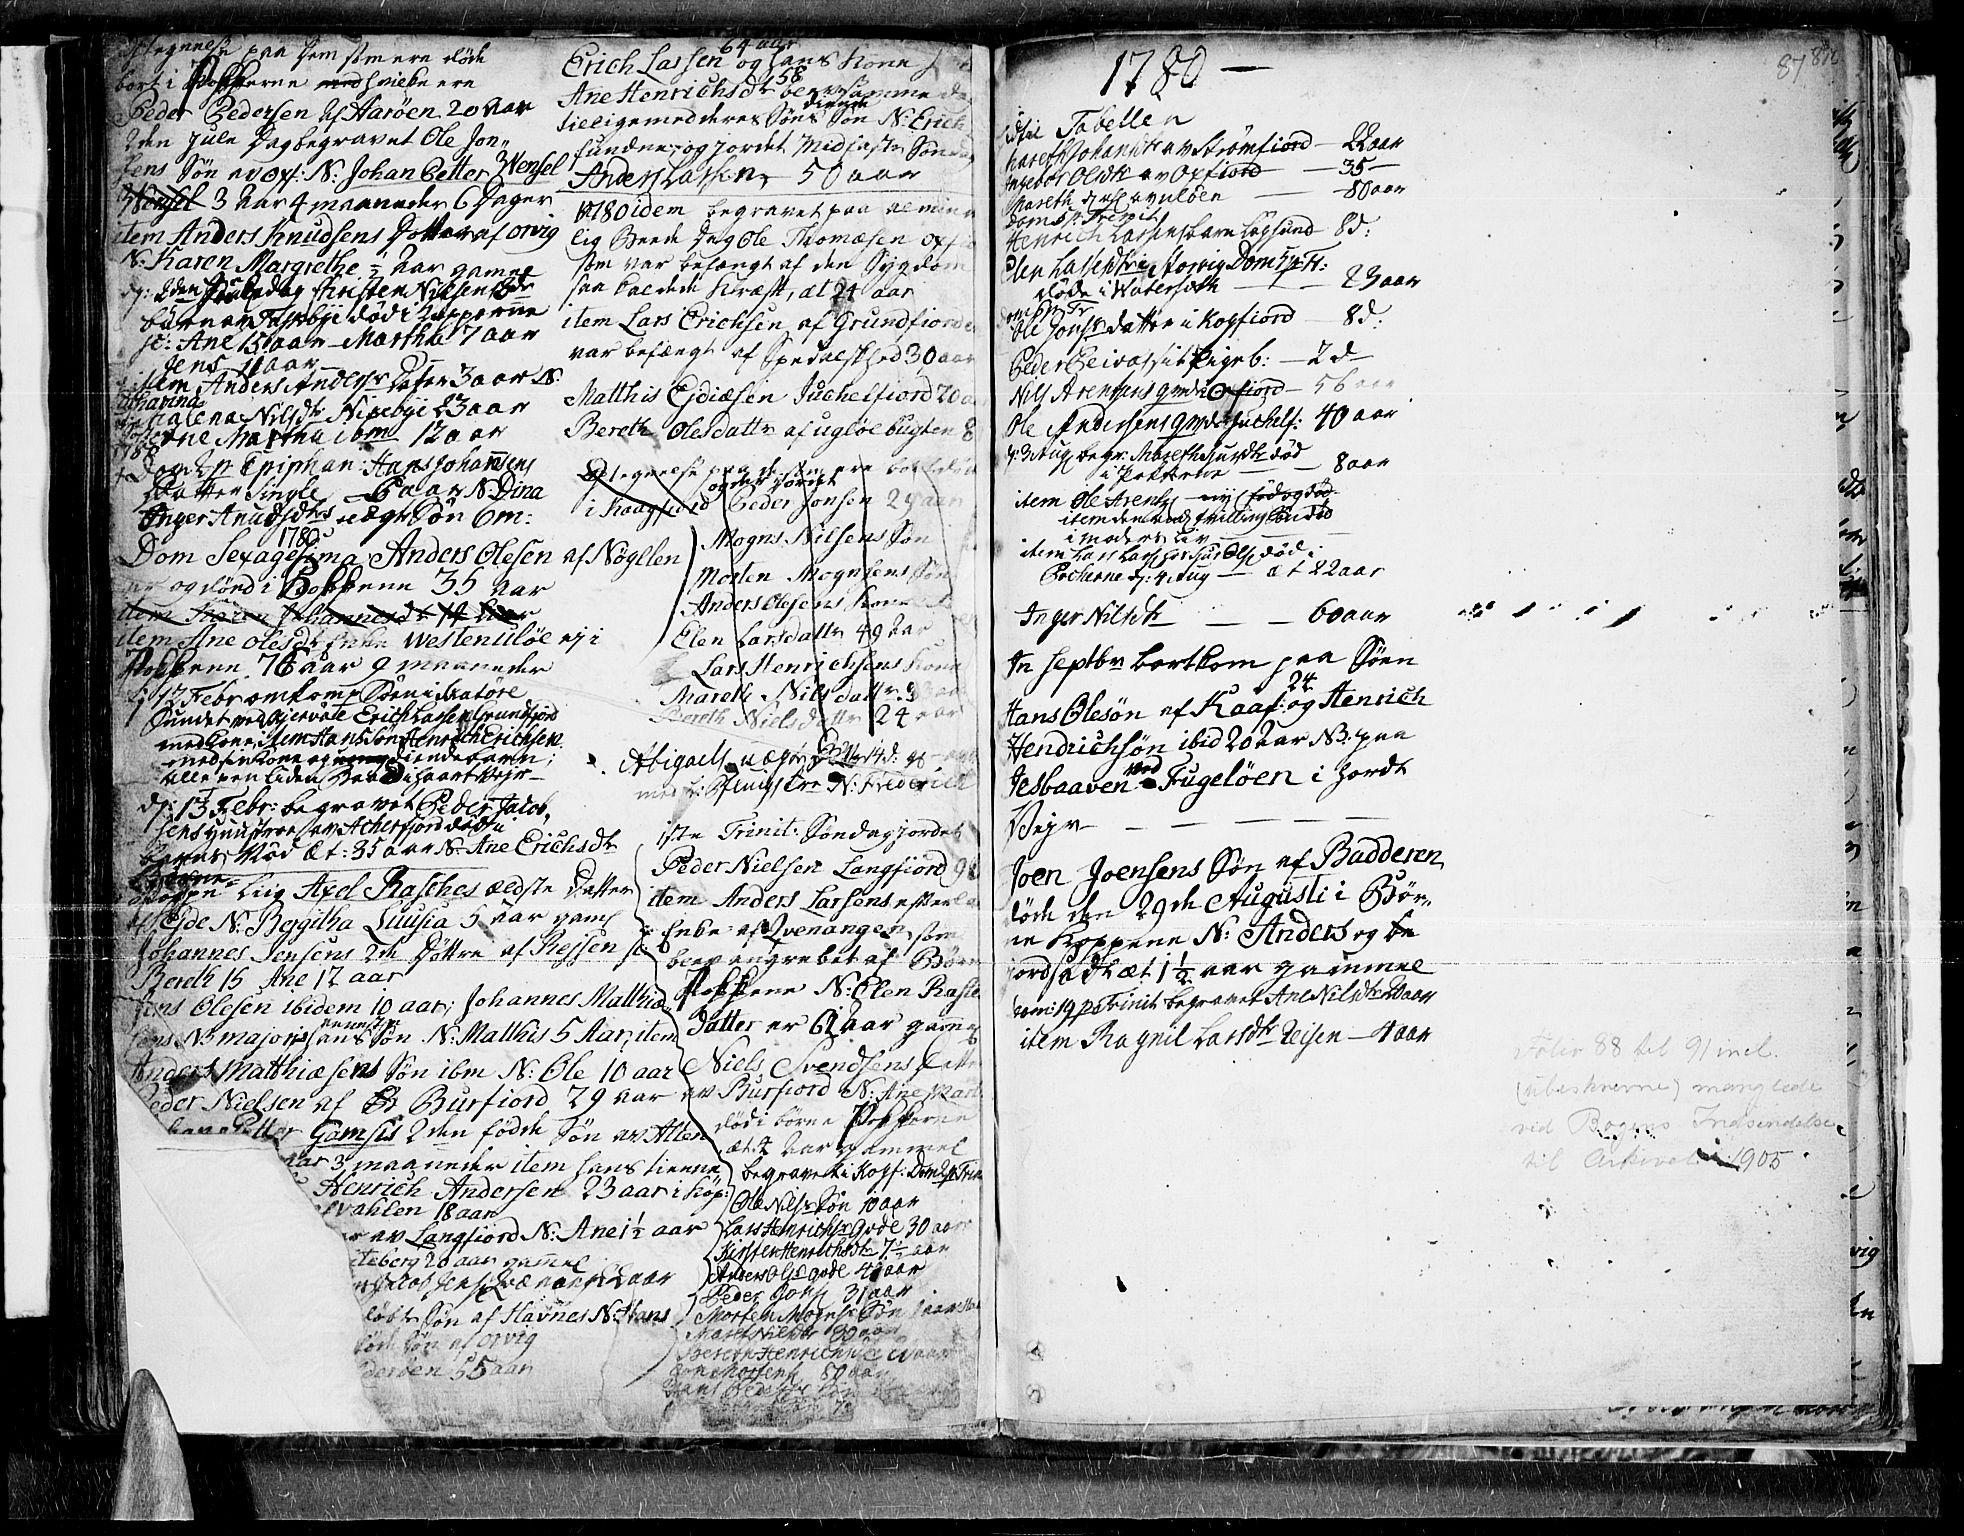 SATØ, Skjervøy sokneprestkontor, H/Ha/Haa/L0001kirke: Ministerialbok nr. 1, 1748-1780, s. 87